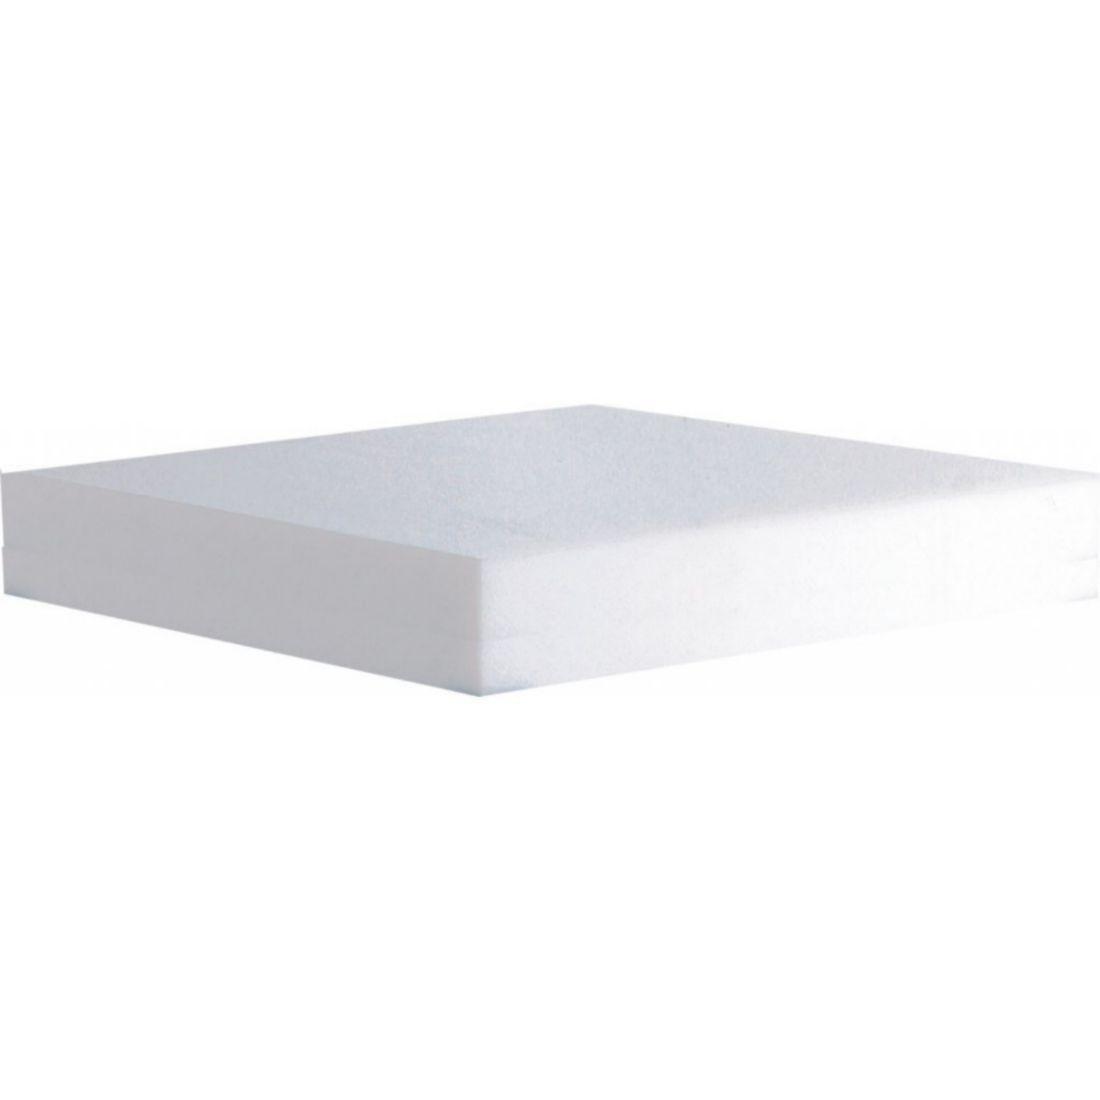 Blok porcovací polyetylen 50x40 cm, výška 8 cm